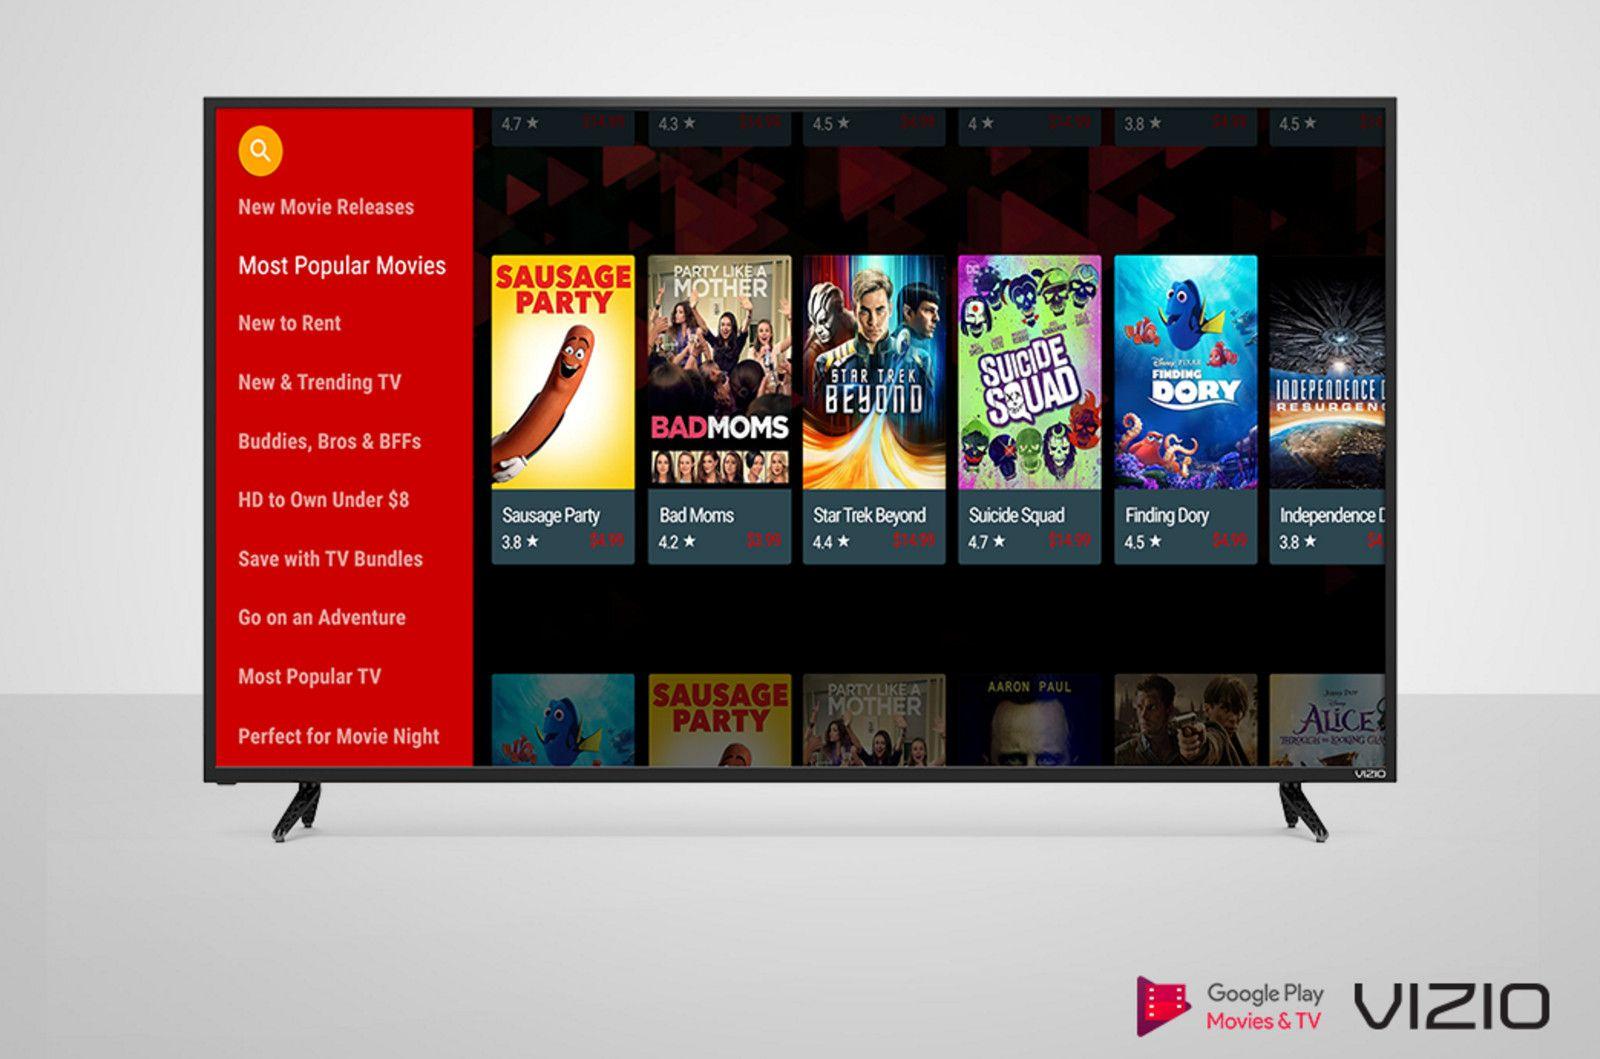 Vizio tvs add the google play video app vizio has been